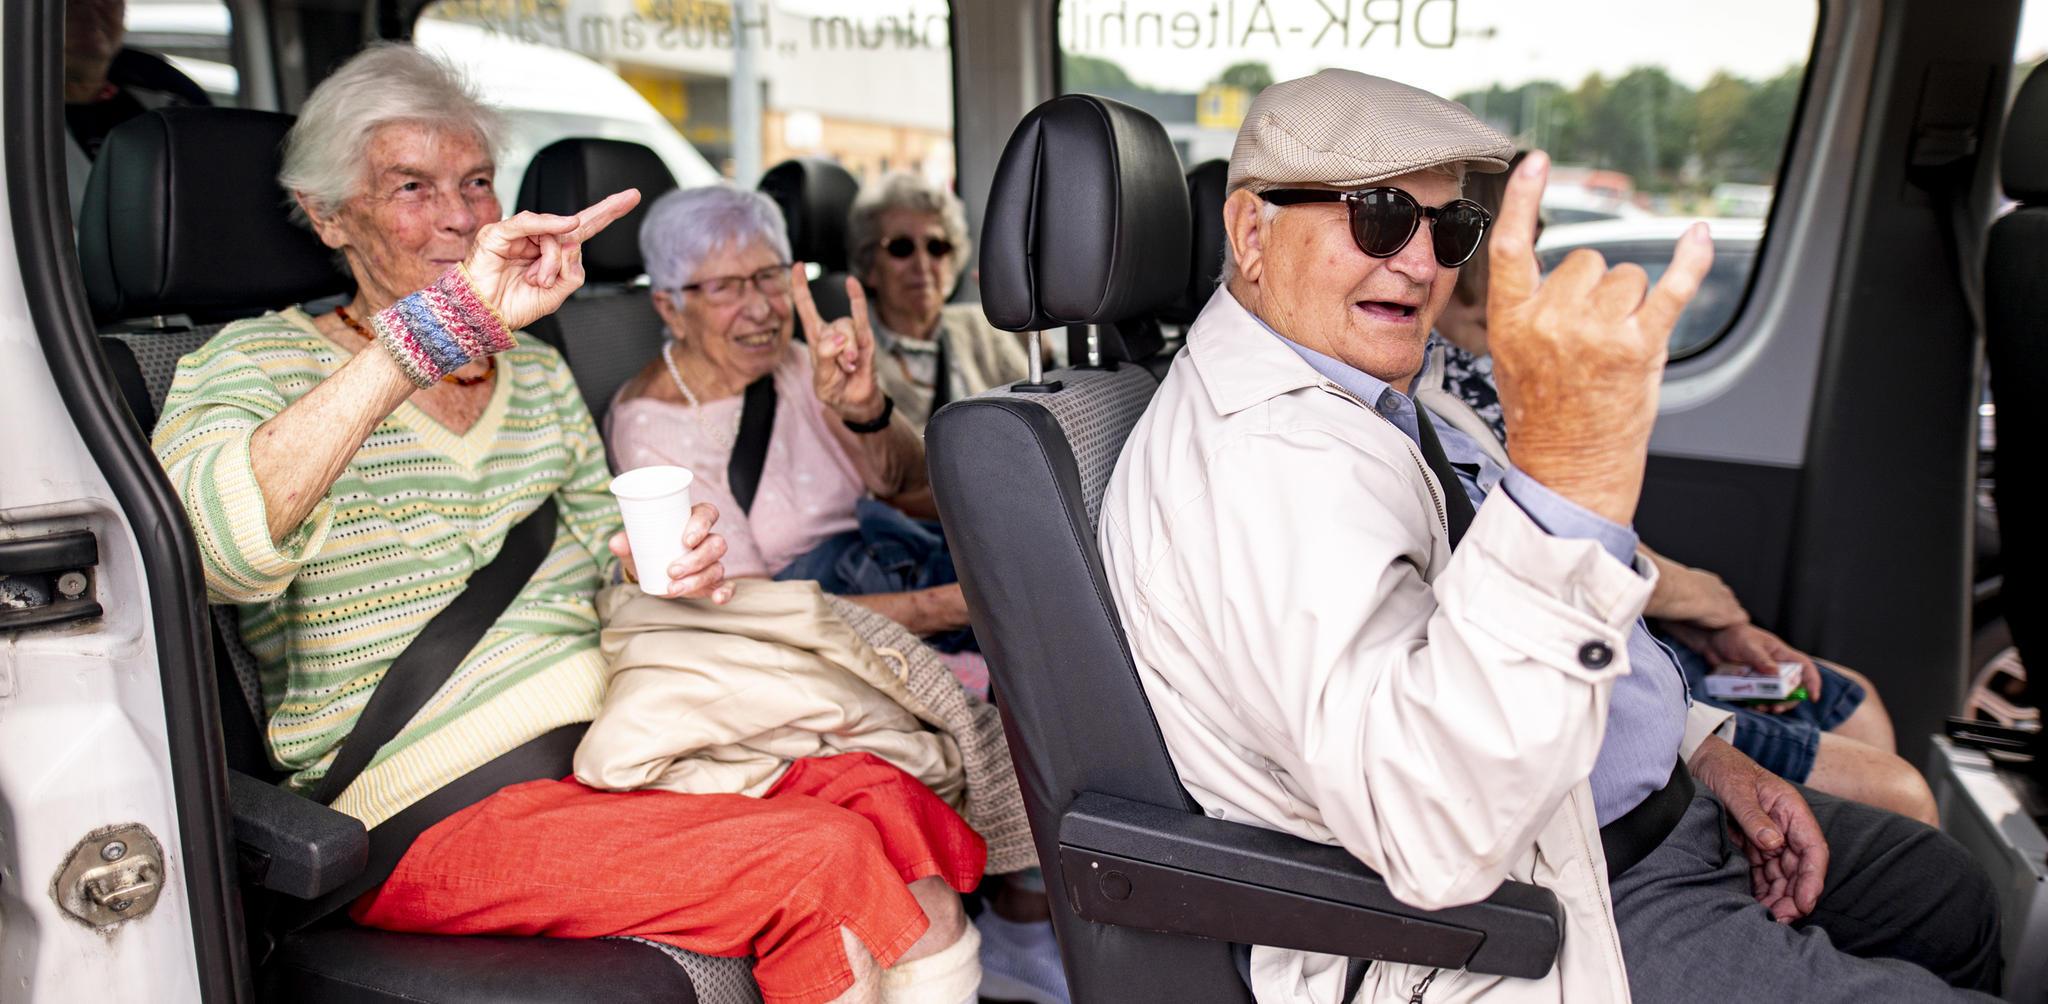 Seniorenheim auf dem Weg zum Wacken Open Air